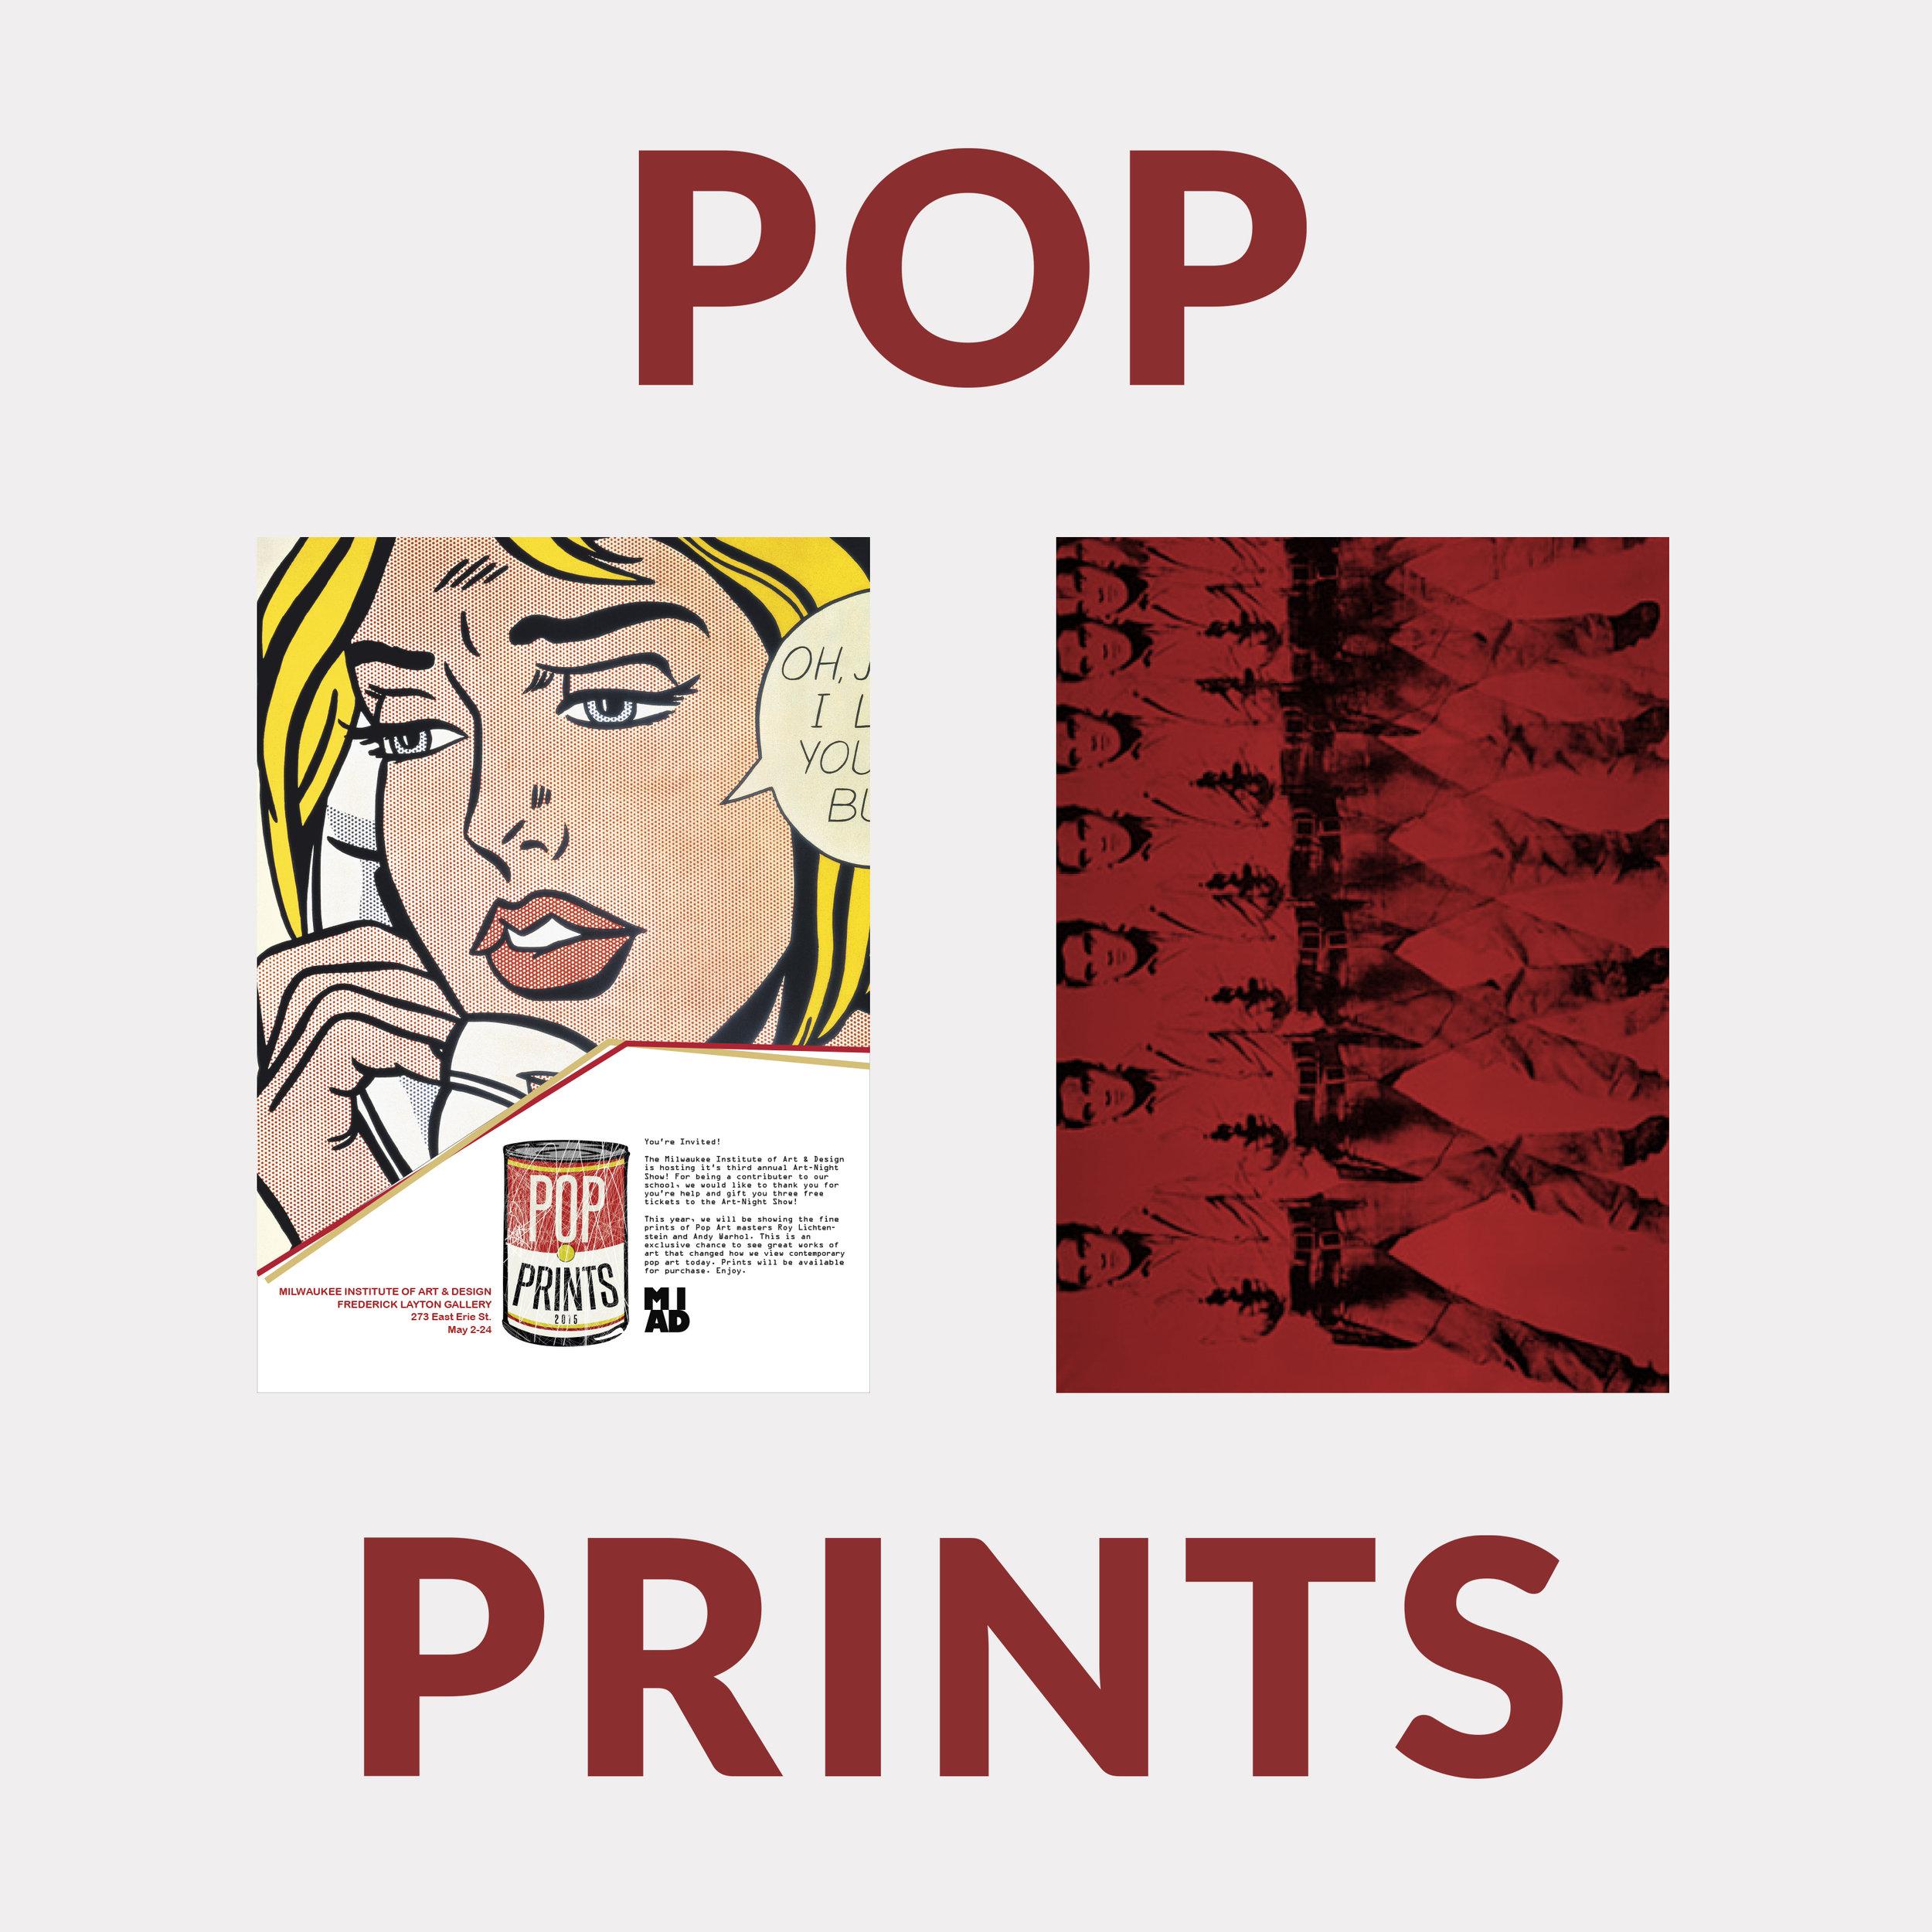 Mahr design_pop prints1.jpg